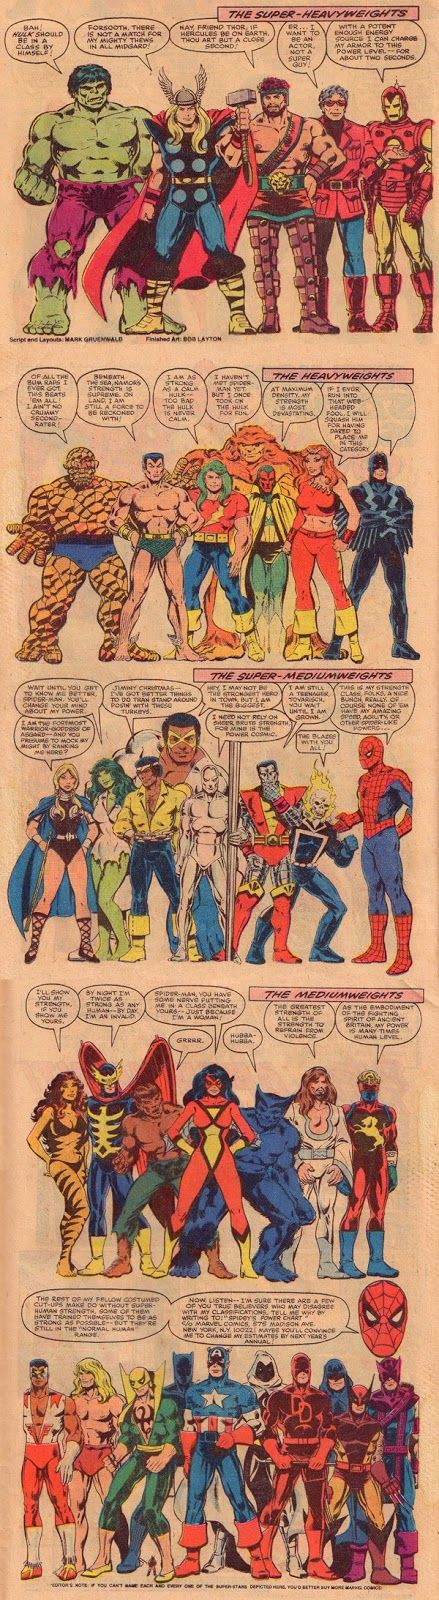 Marvel Strength Chart: Cuáles son los héroes más poderosos?